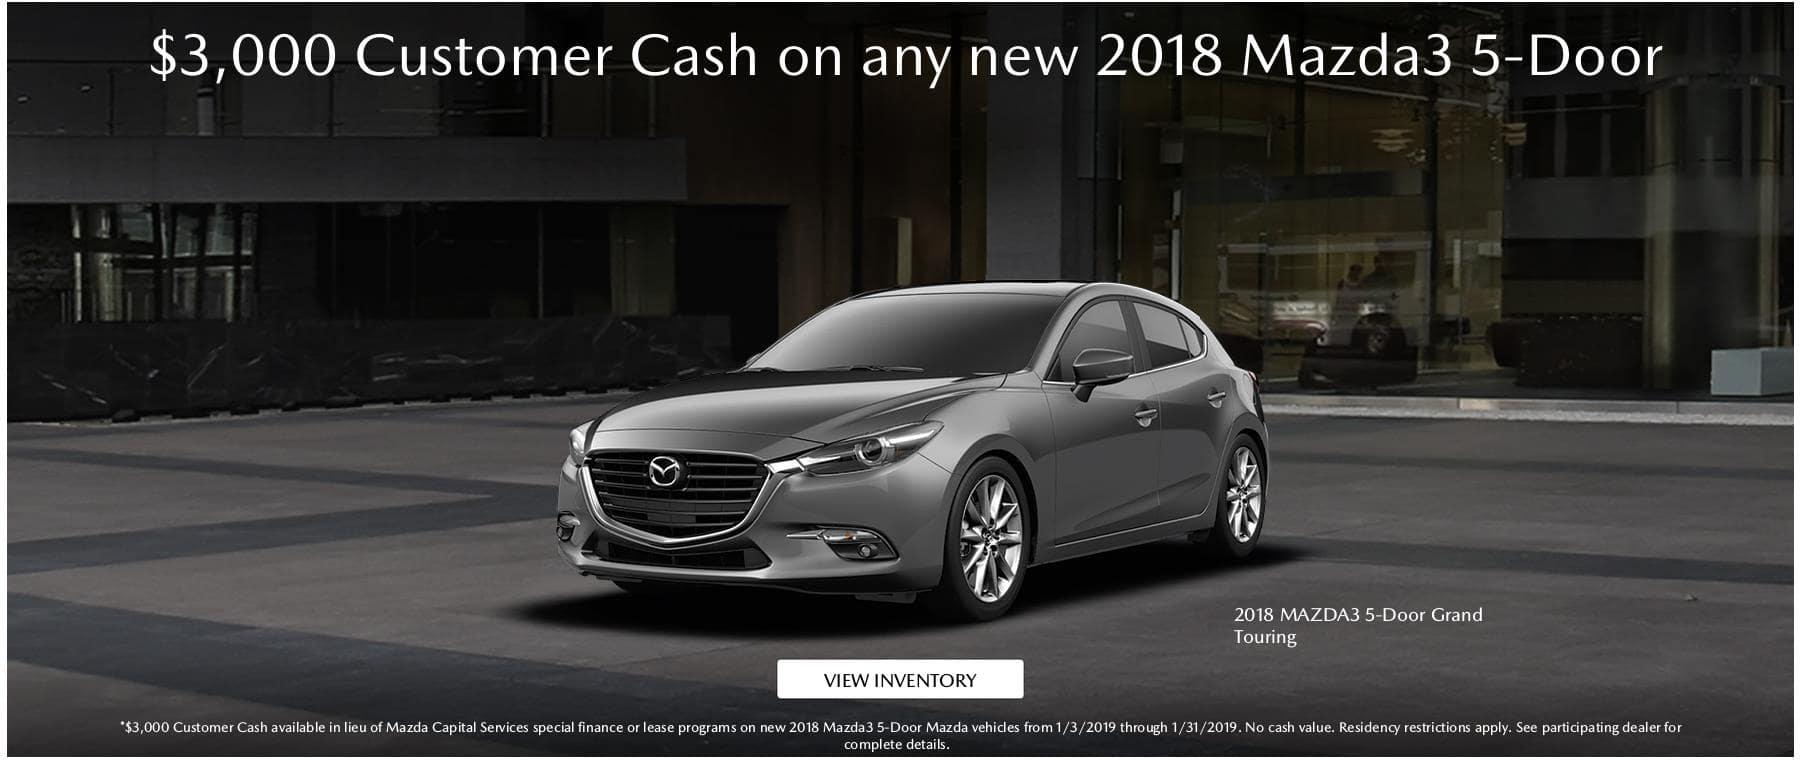 MY18 Mazda3 5dr 3000CC_1800x760